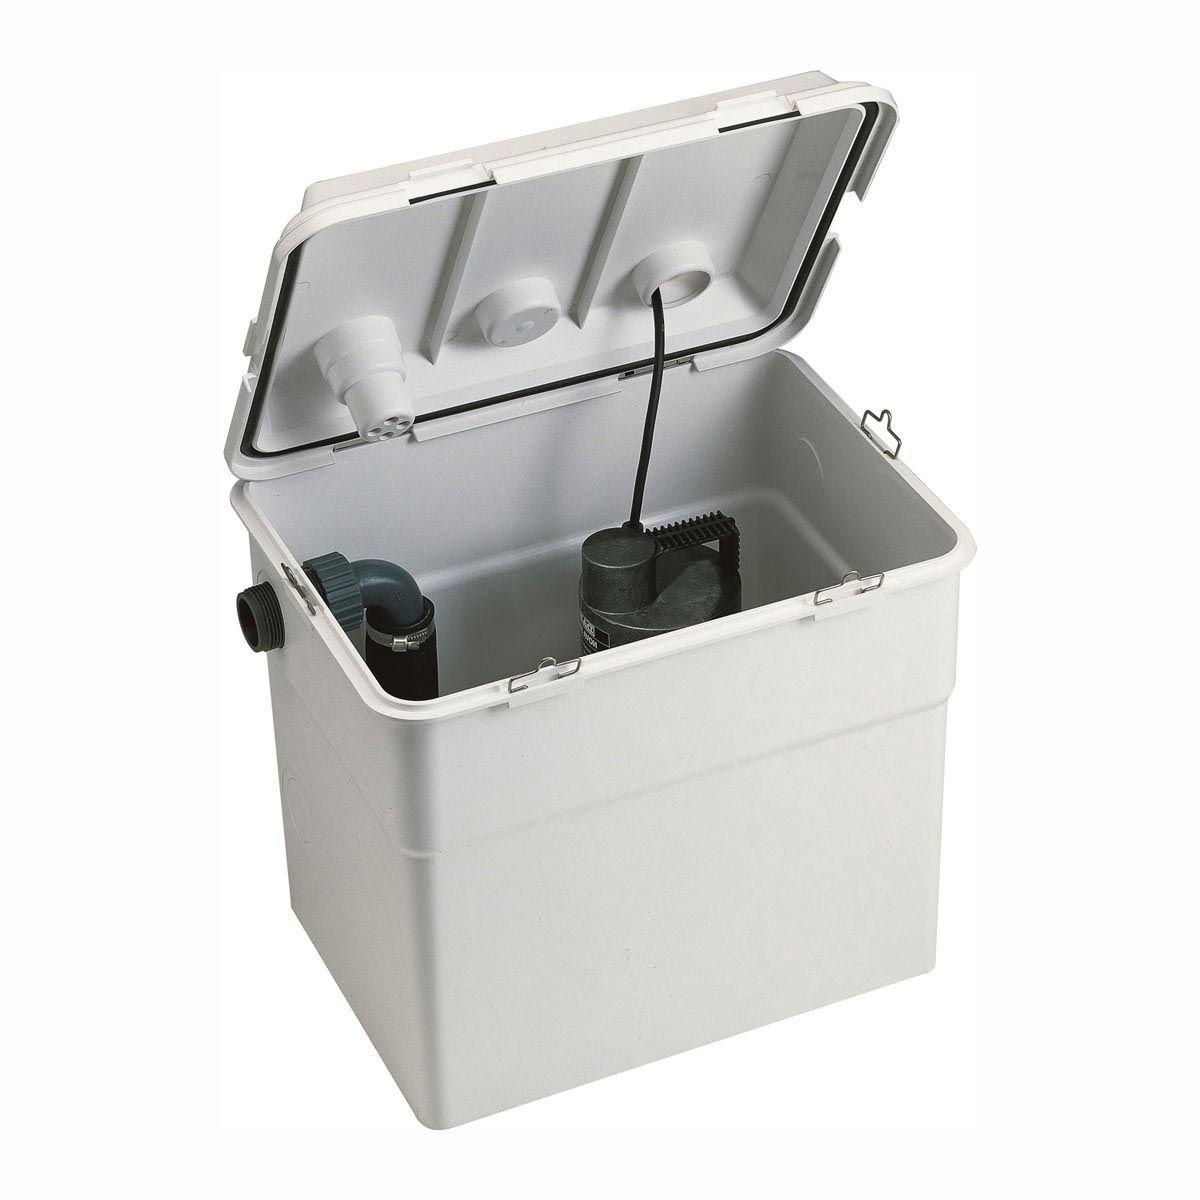 Collecteur FapaBox 7, H max. 6,90m, Qmax. 7200l/h, 0,29kW, 407 x 309 x 360 mm, 30 l, 230 V